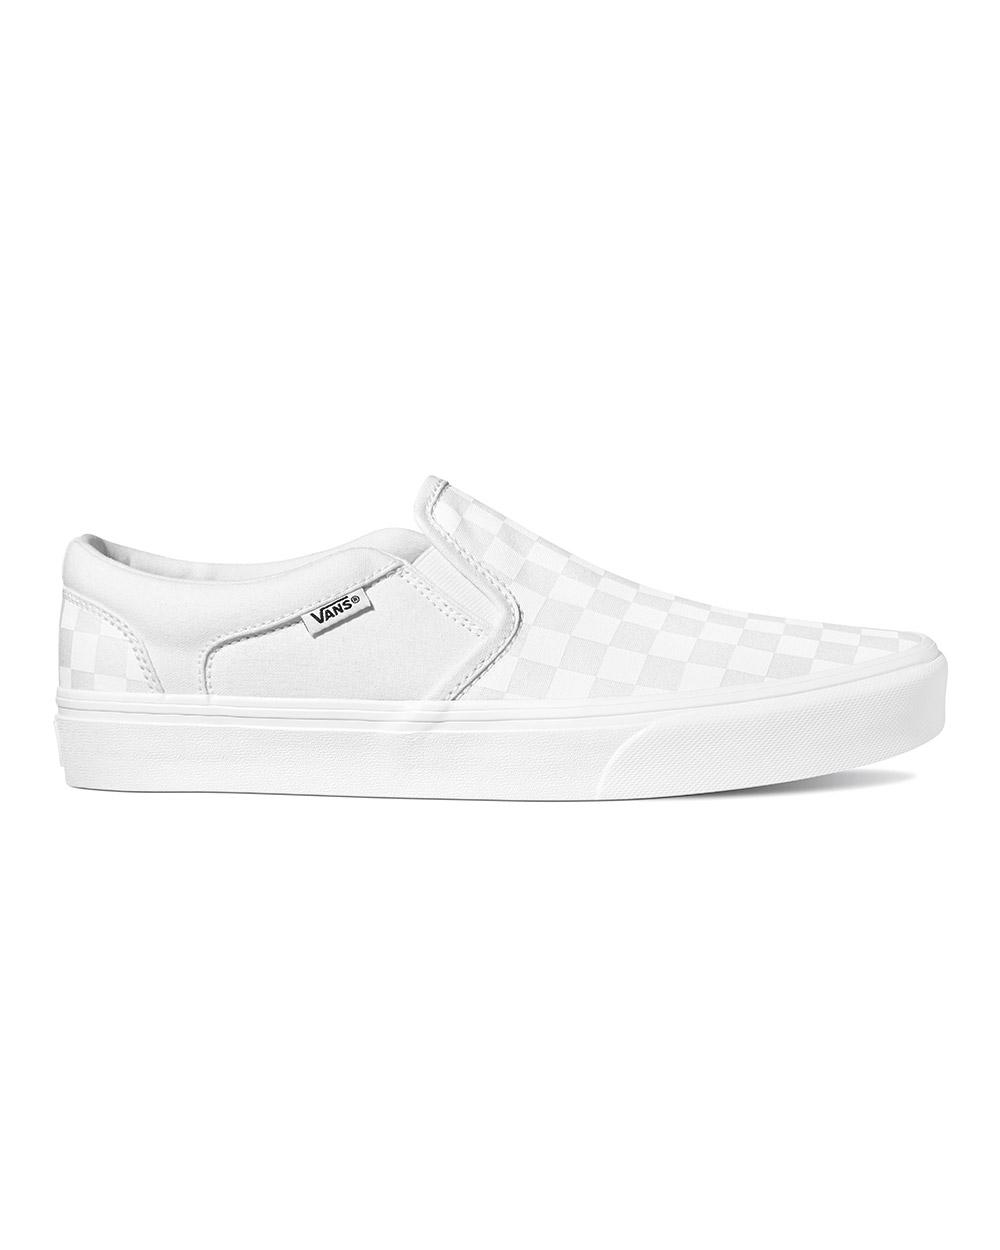 Vans Asher Checkerboard (white/white